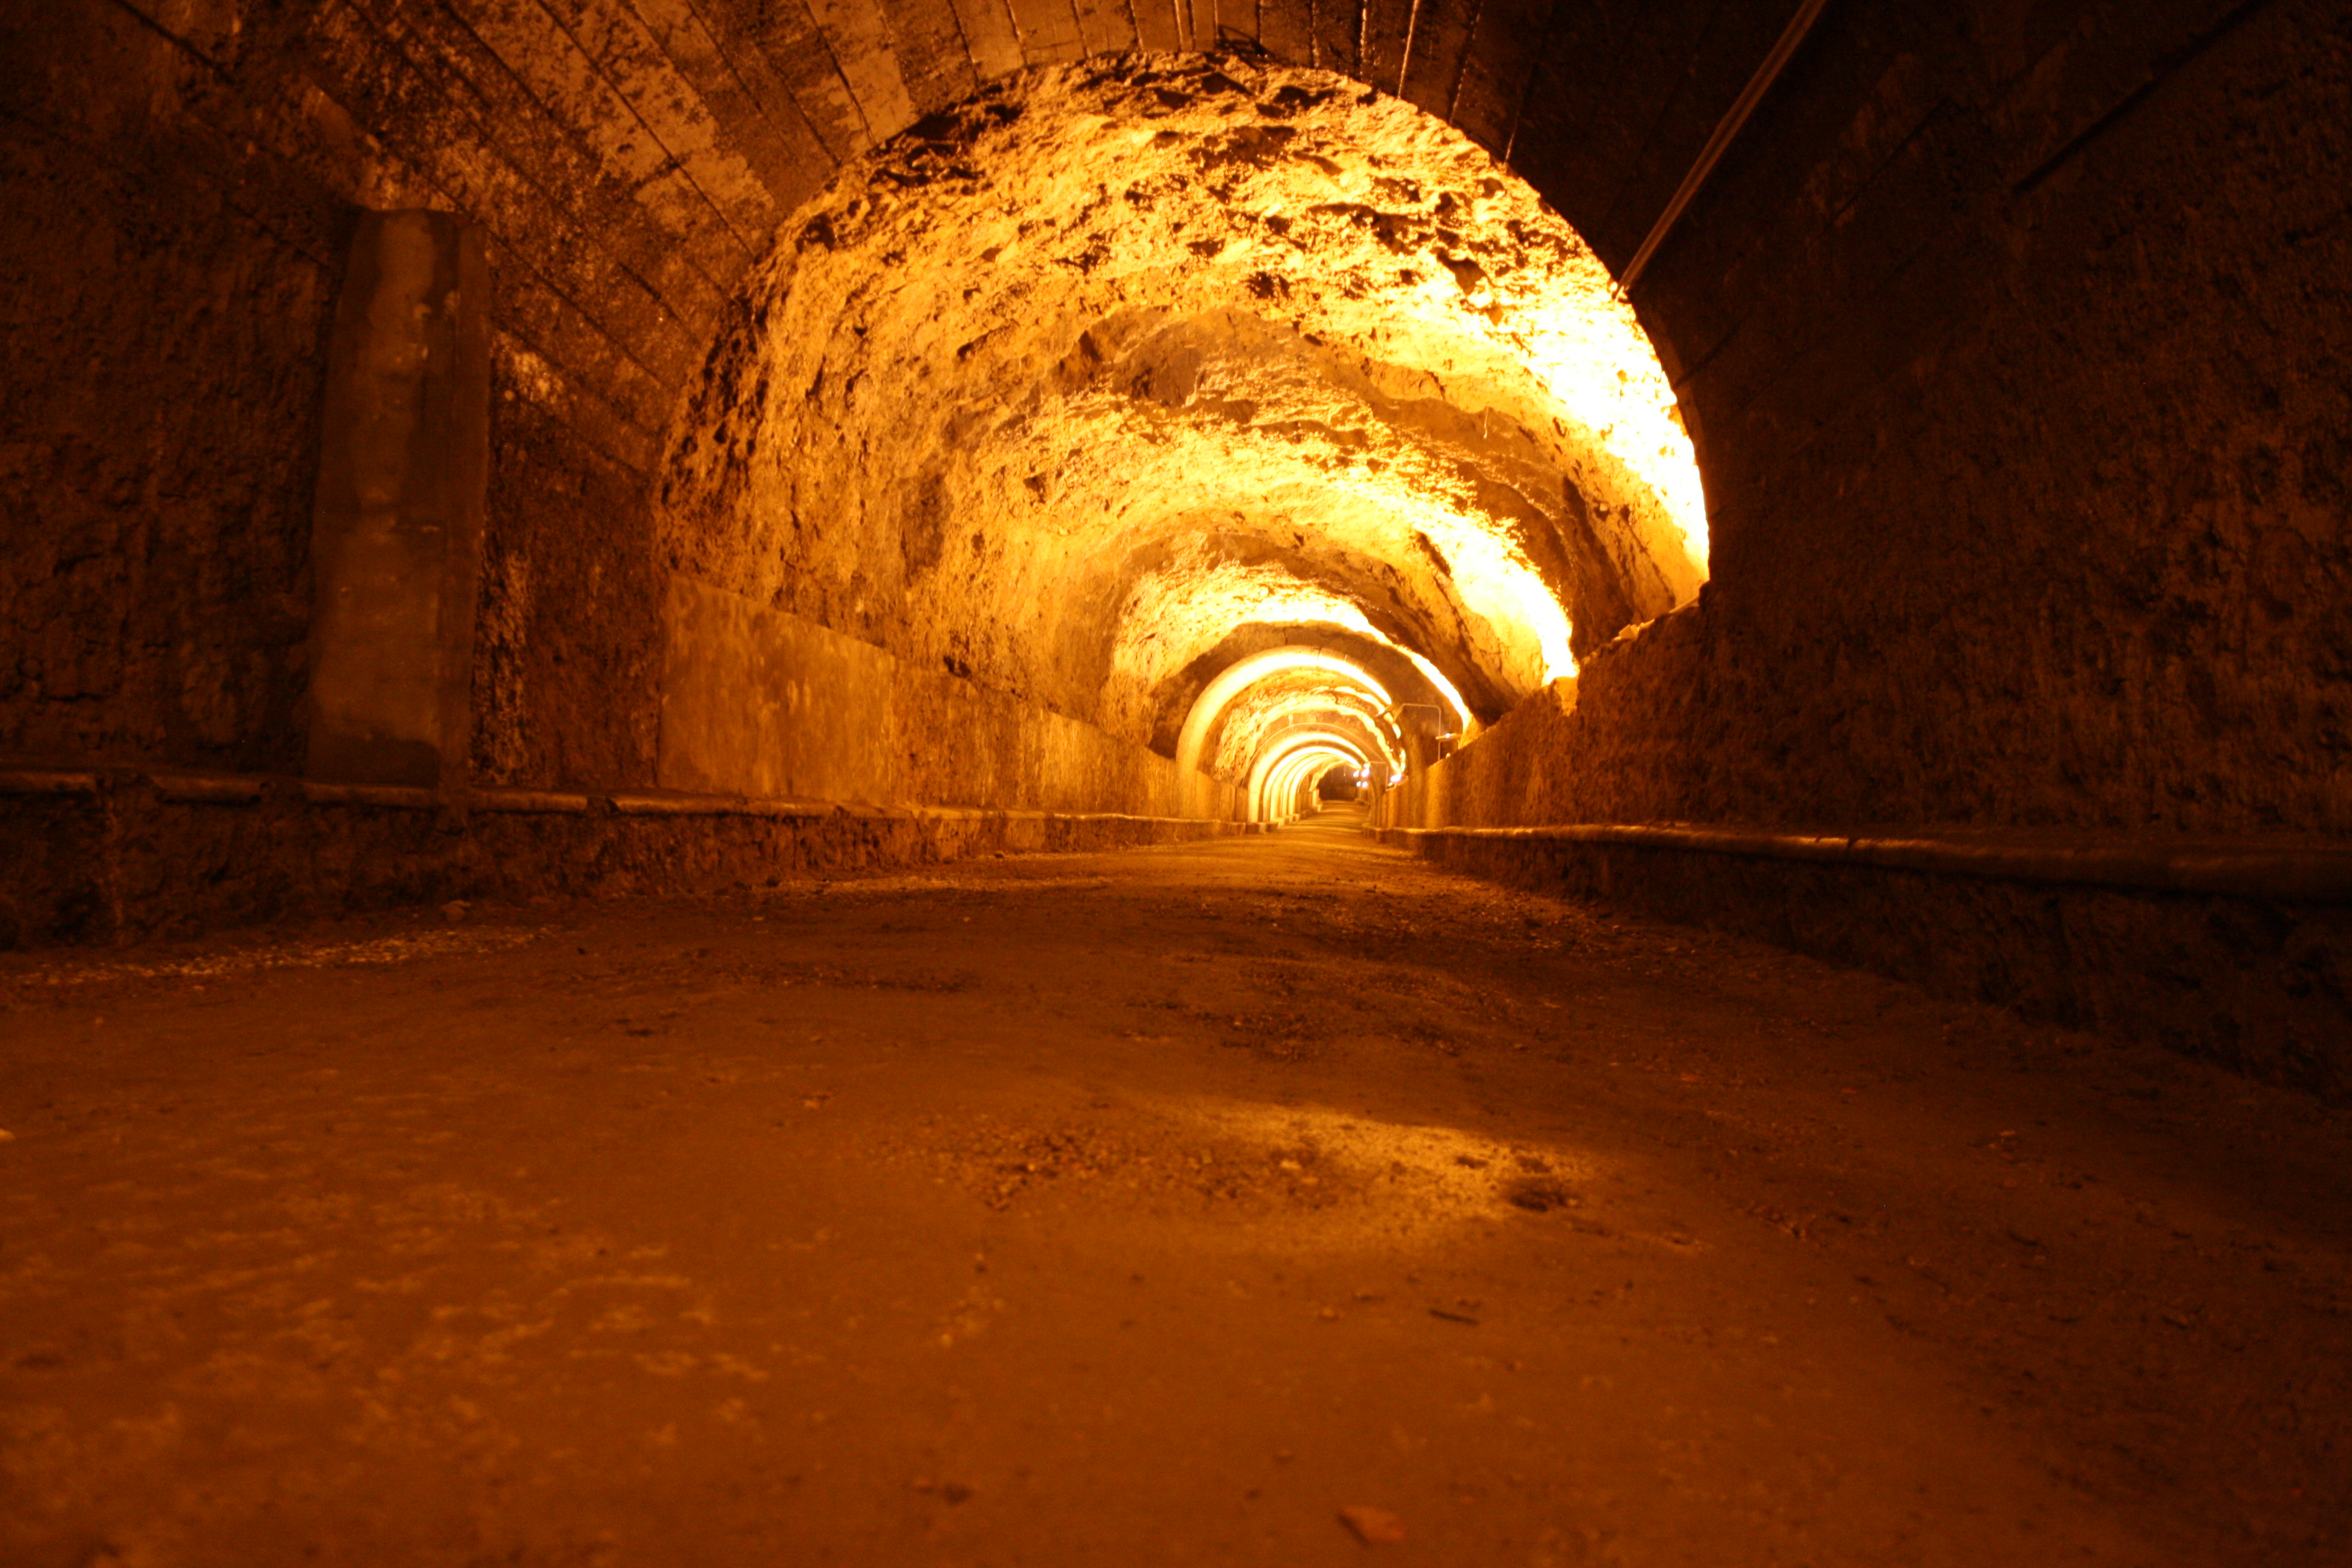 Toscana underground: Rifugio della Martana